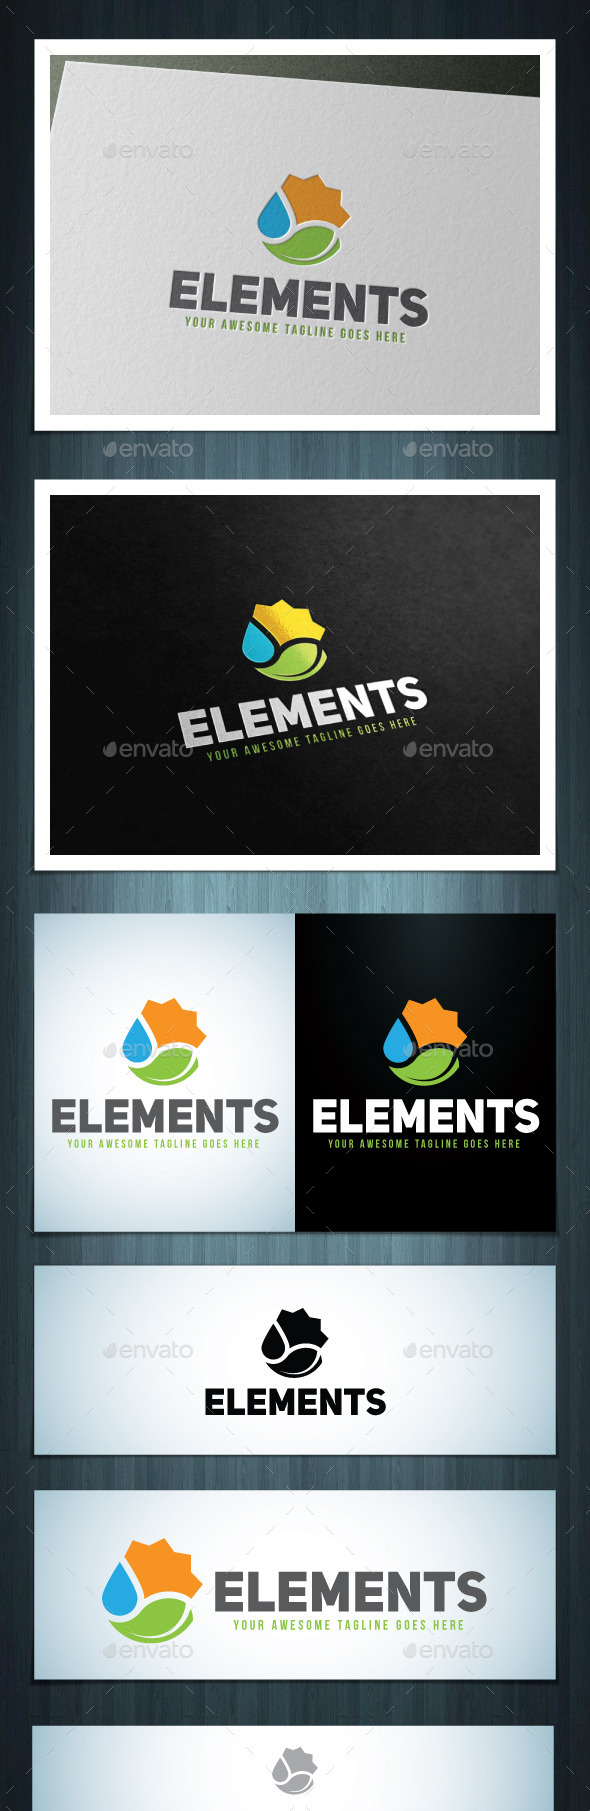 Elements - Nature Logo Templates